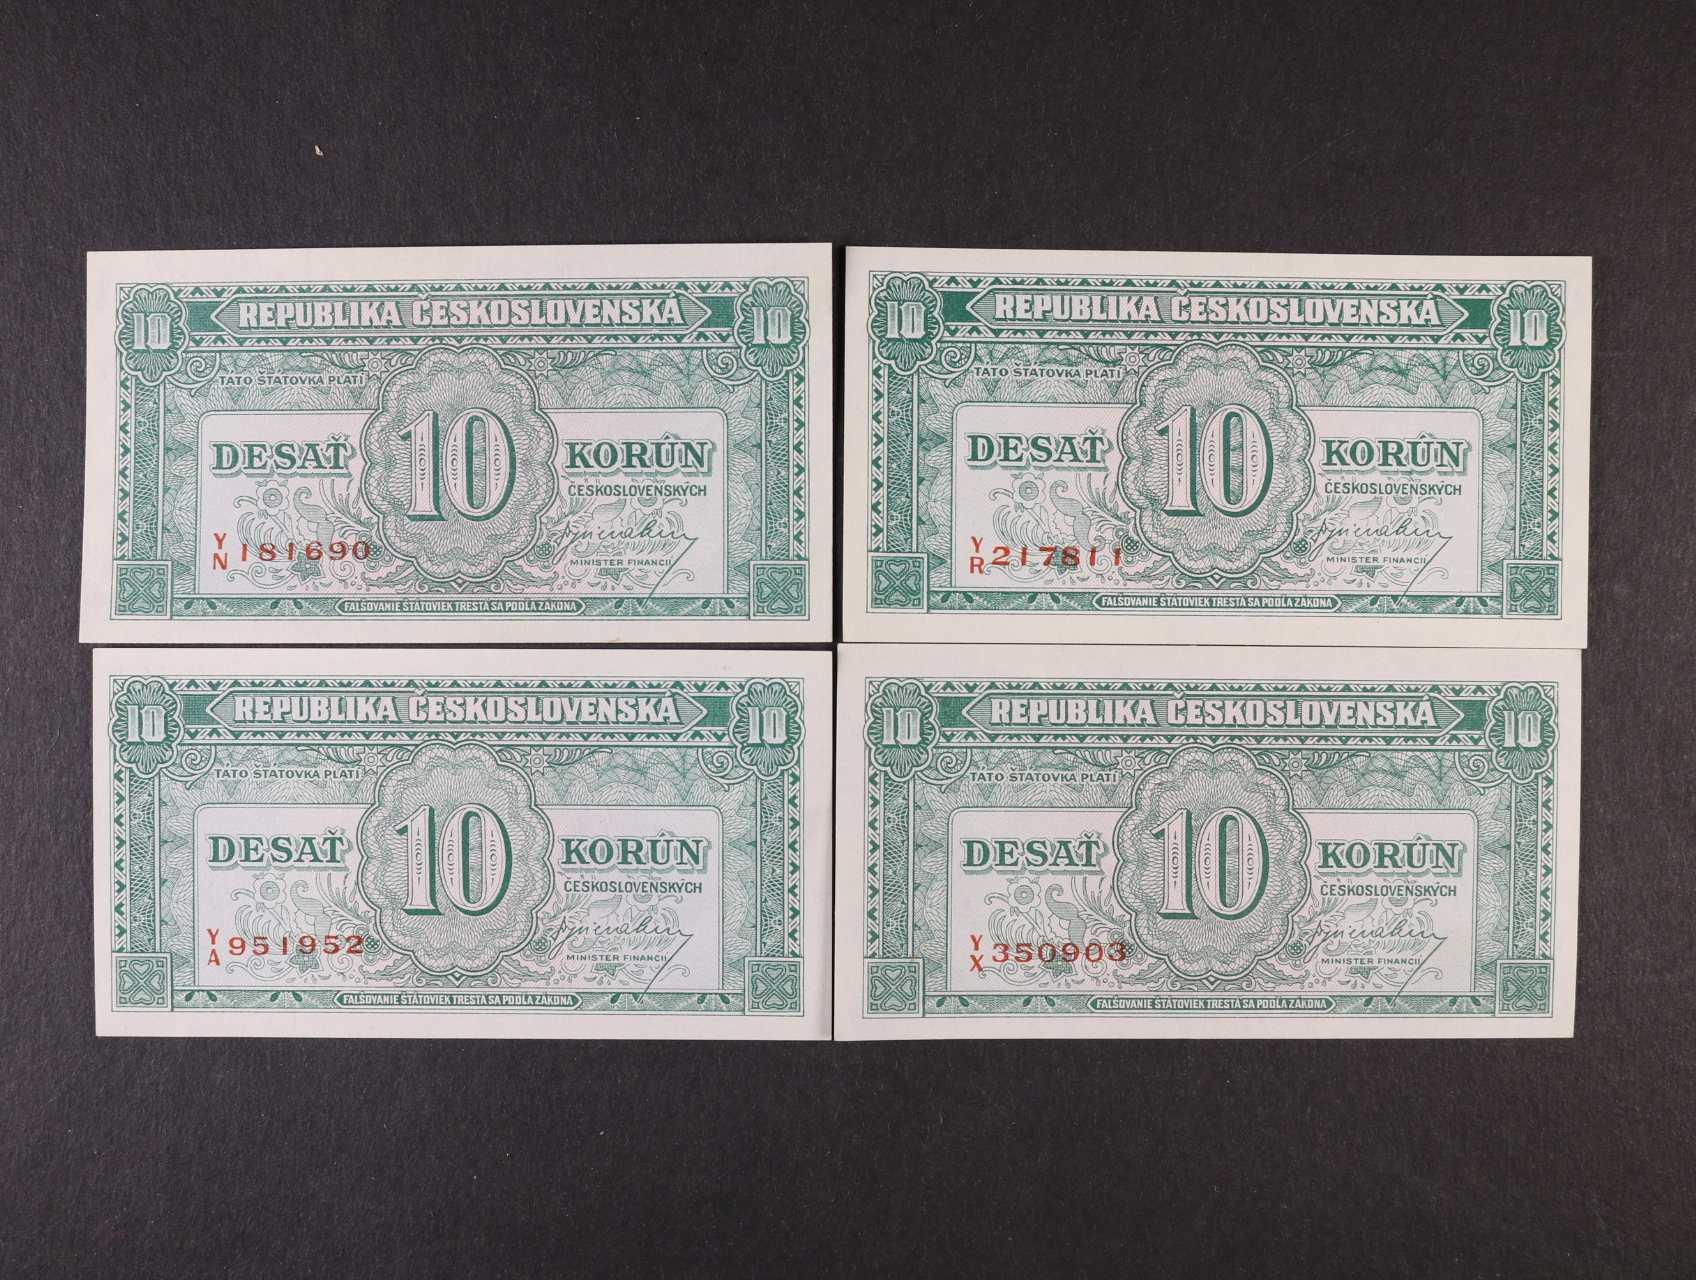 10 Kčs 1945 série Y/A, Y/N, Y/R, Y/X, Ba. 71, Pi. 60a, 4ks